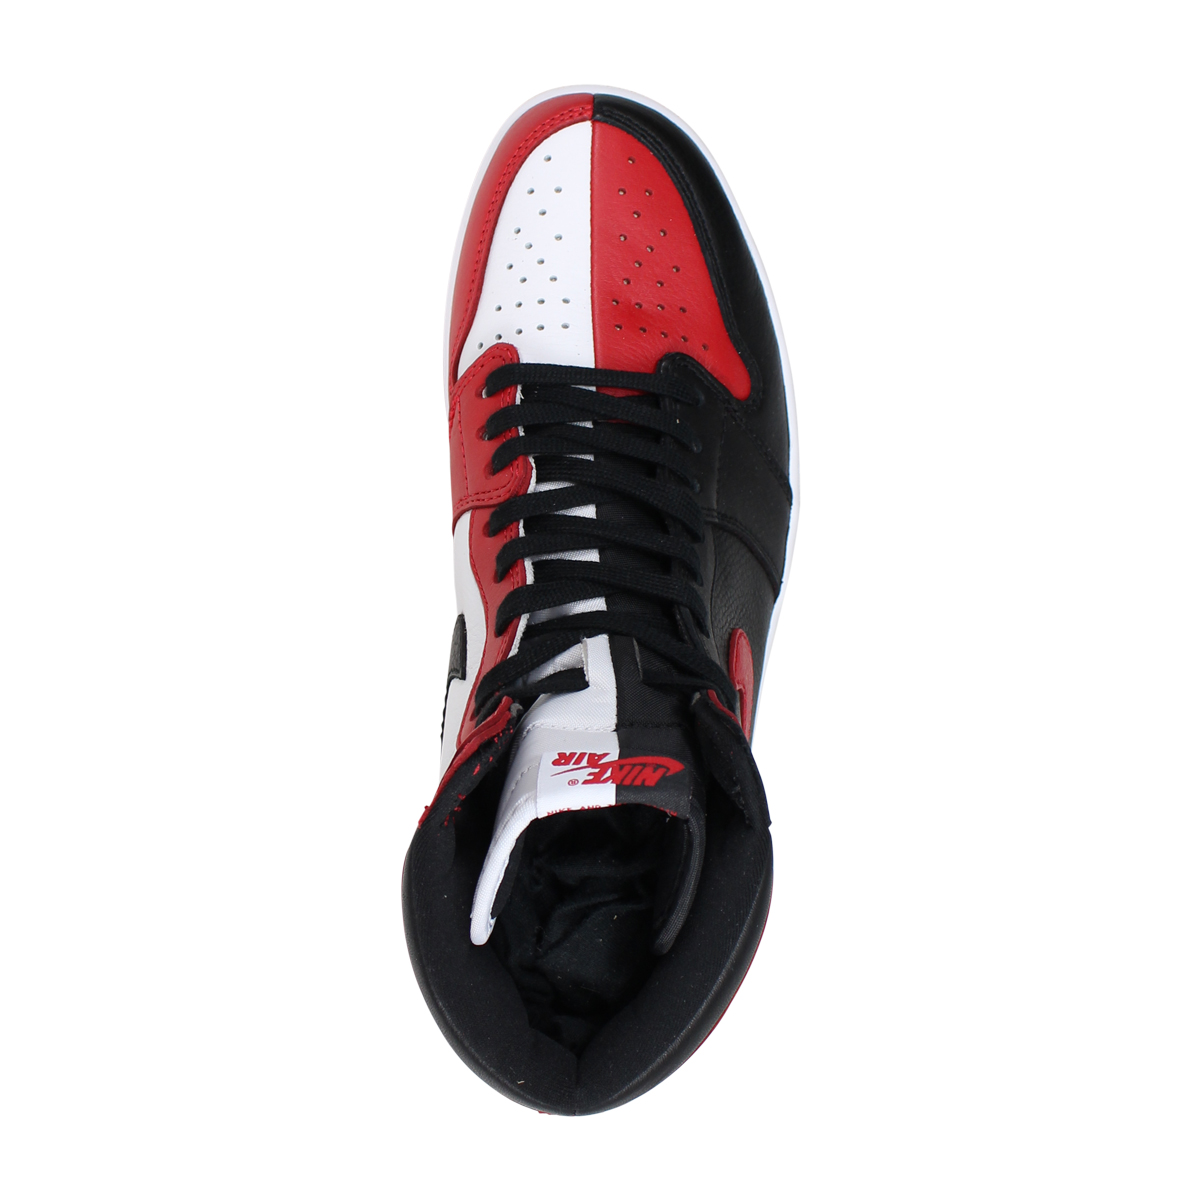 sale retailer 282f0 00cec NIKE AIR JORDAN 1 RETRO HIGH OG HOMAGE TO HOME Nike Air Jordan 1 nostalgic high  men gap Dis sneakers 861,428-061 red  9 6 Shinnyu load   189